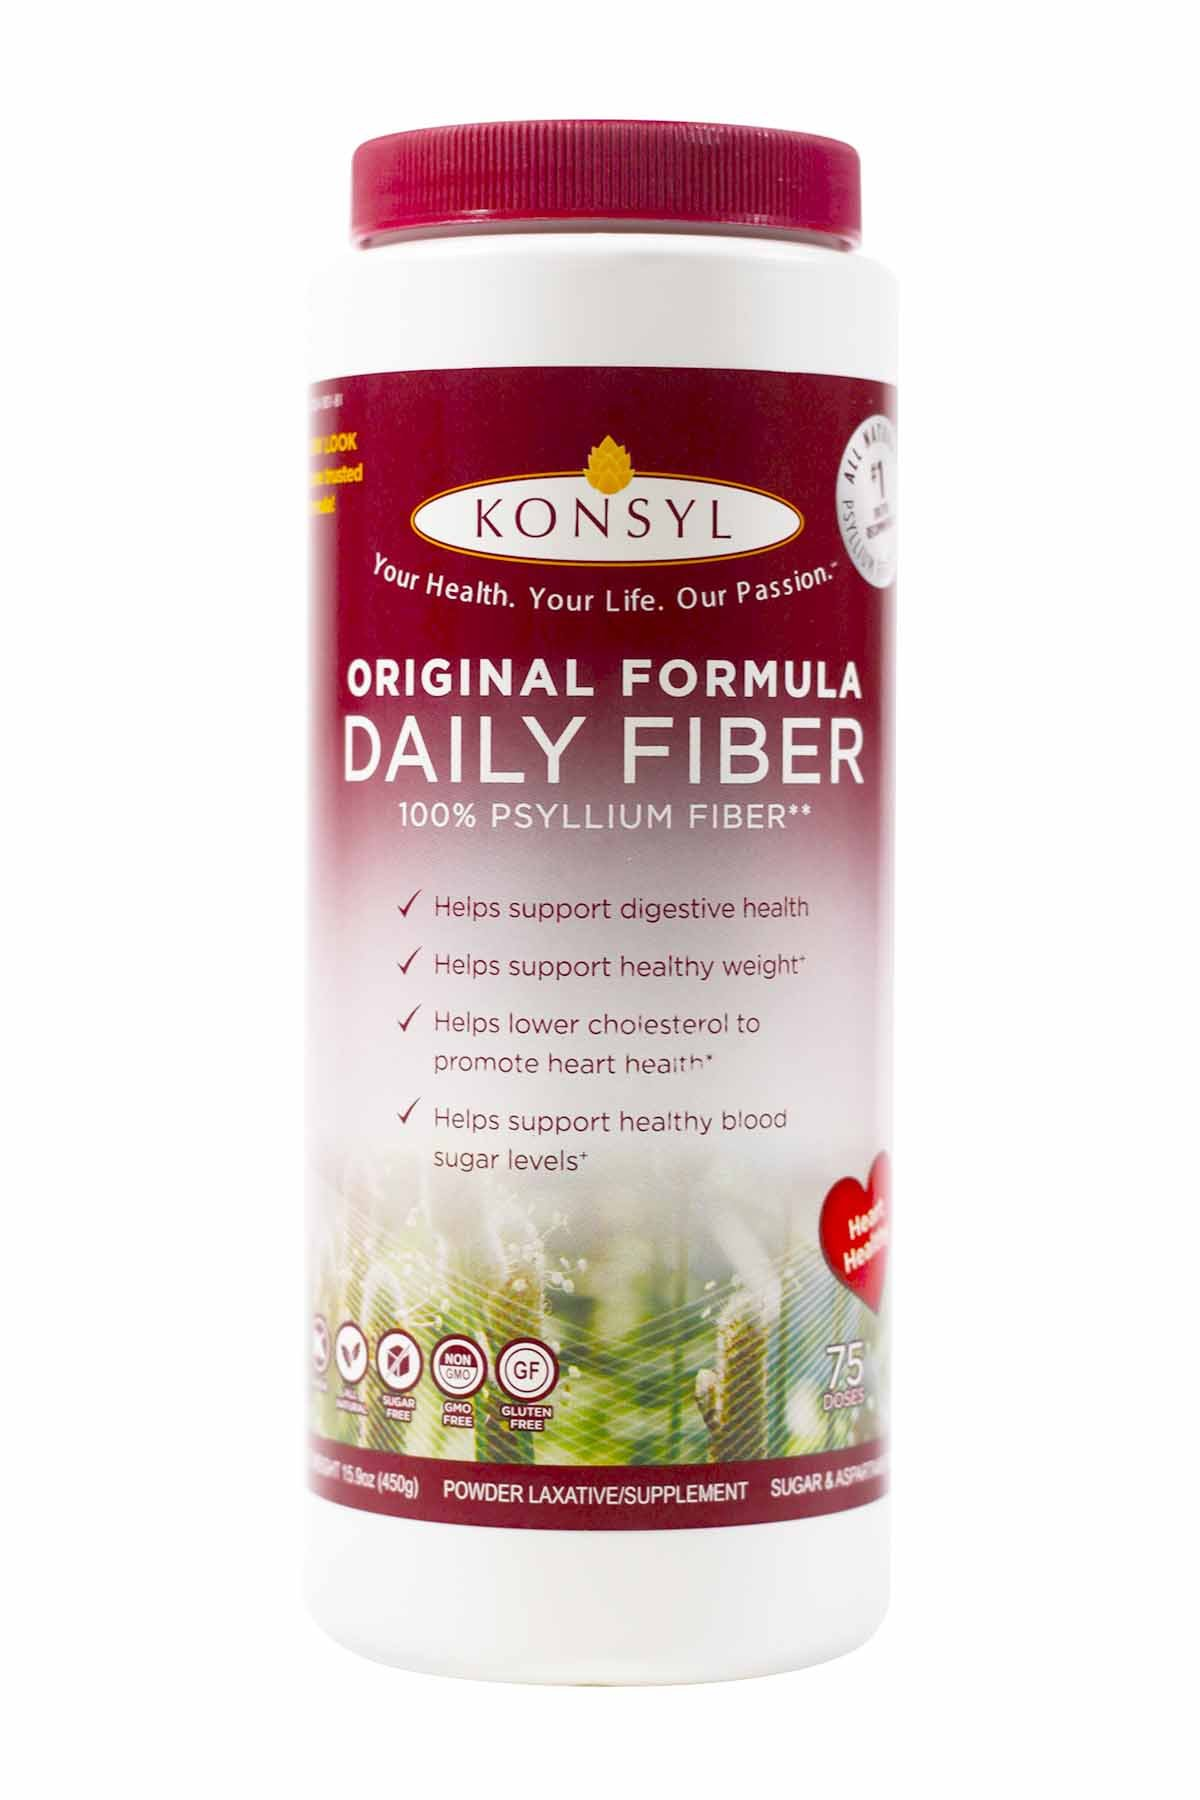 Konsyl Original Formula Psyllium Fiber 15.9 oz (Pack of 3) by Konsyl (Image #1)